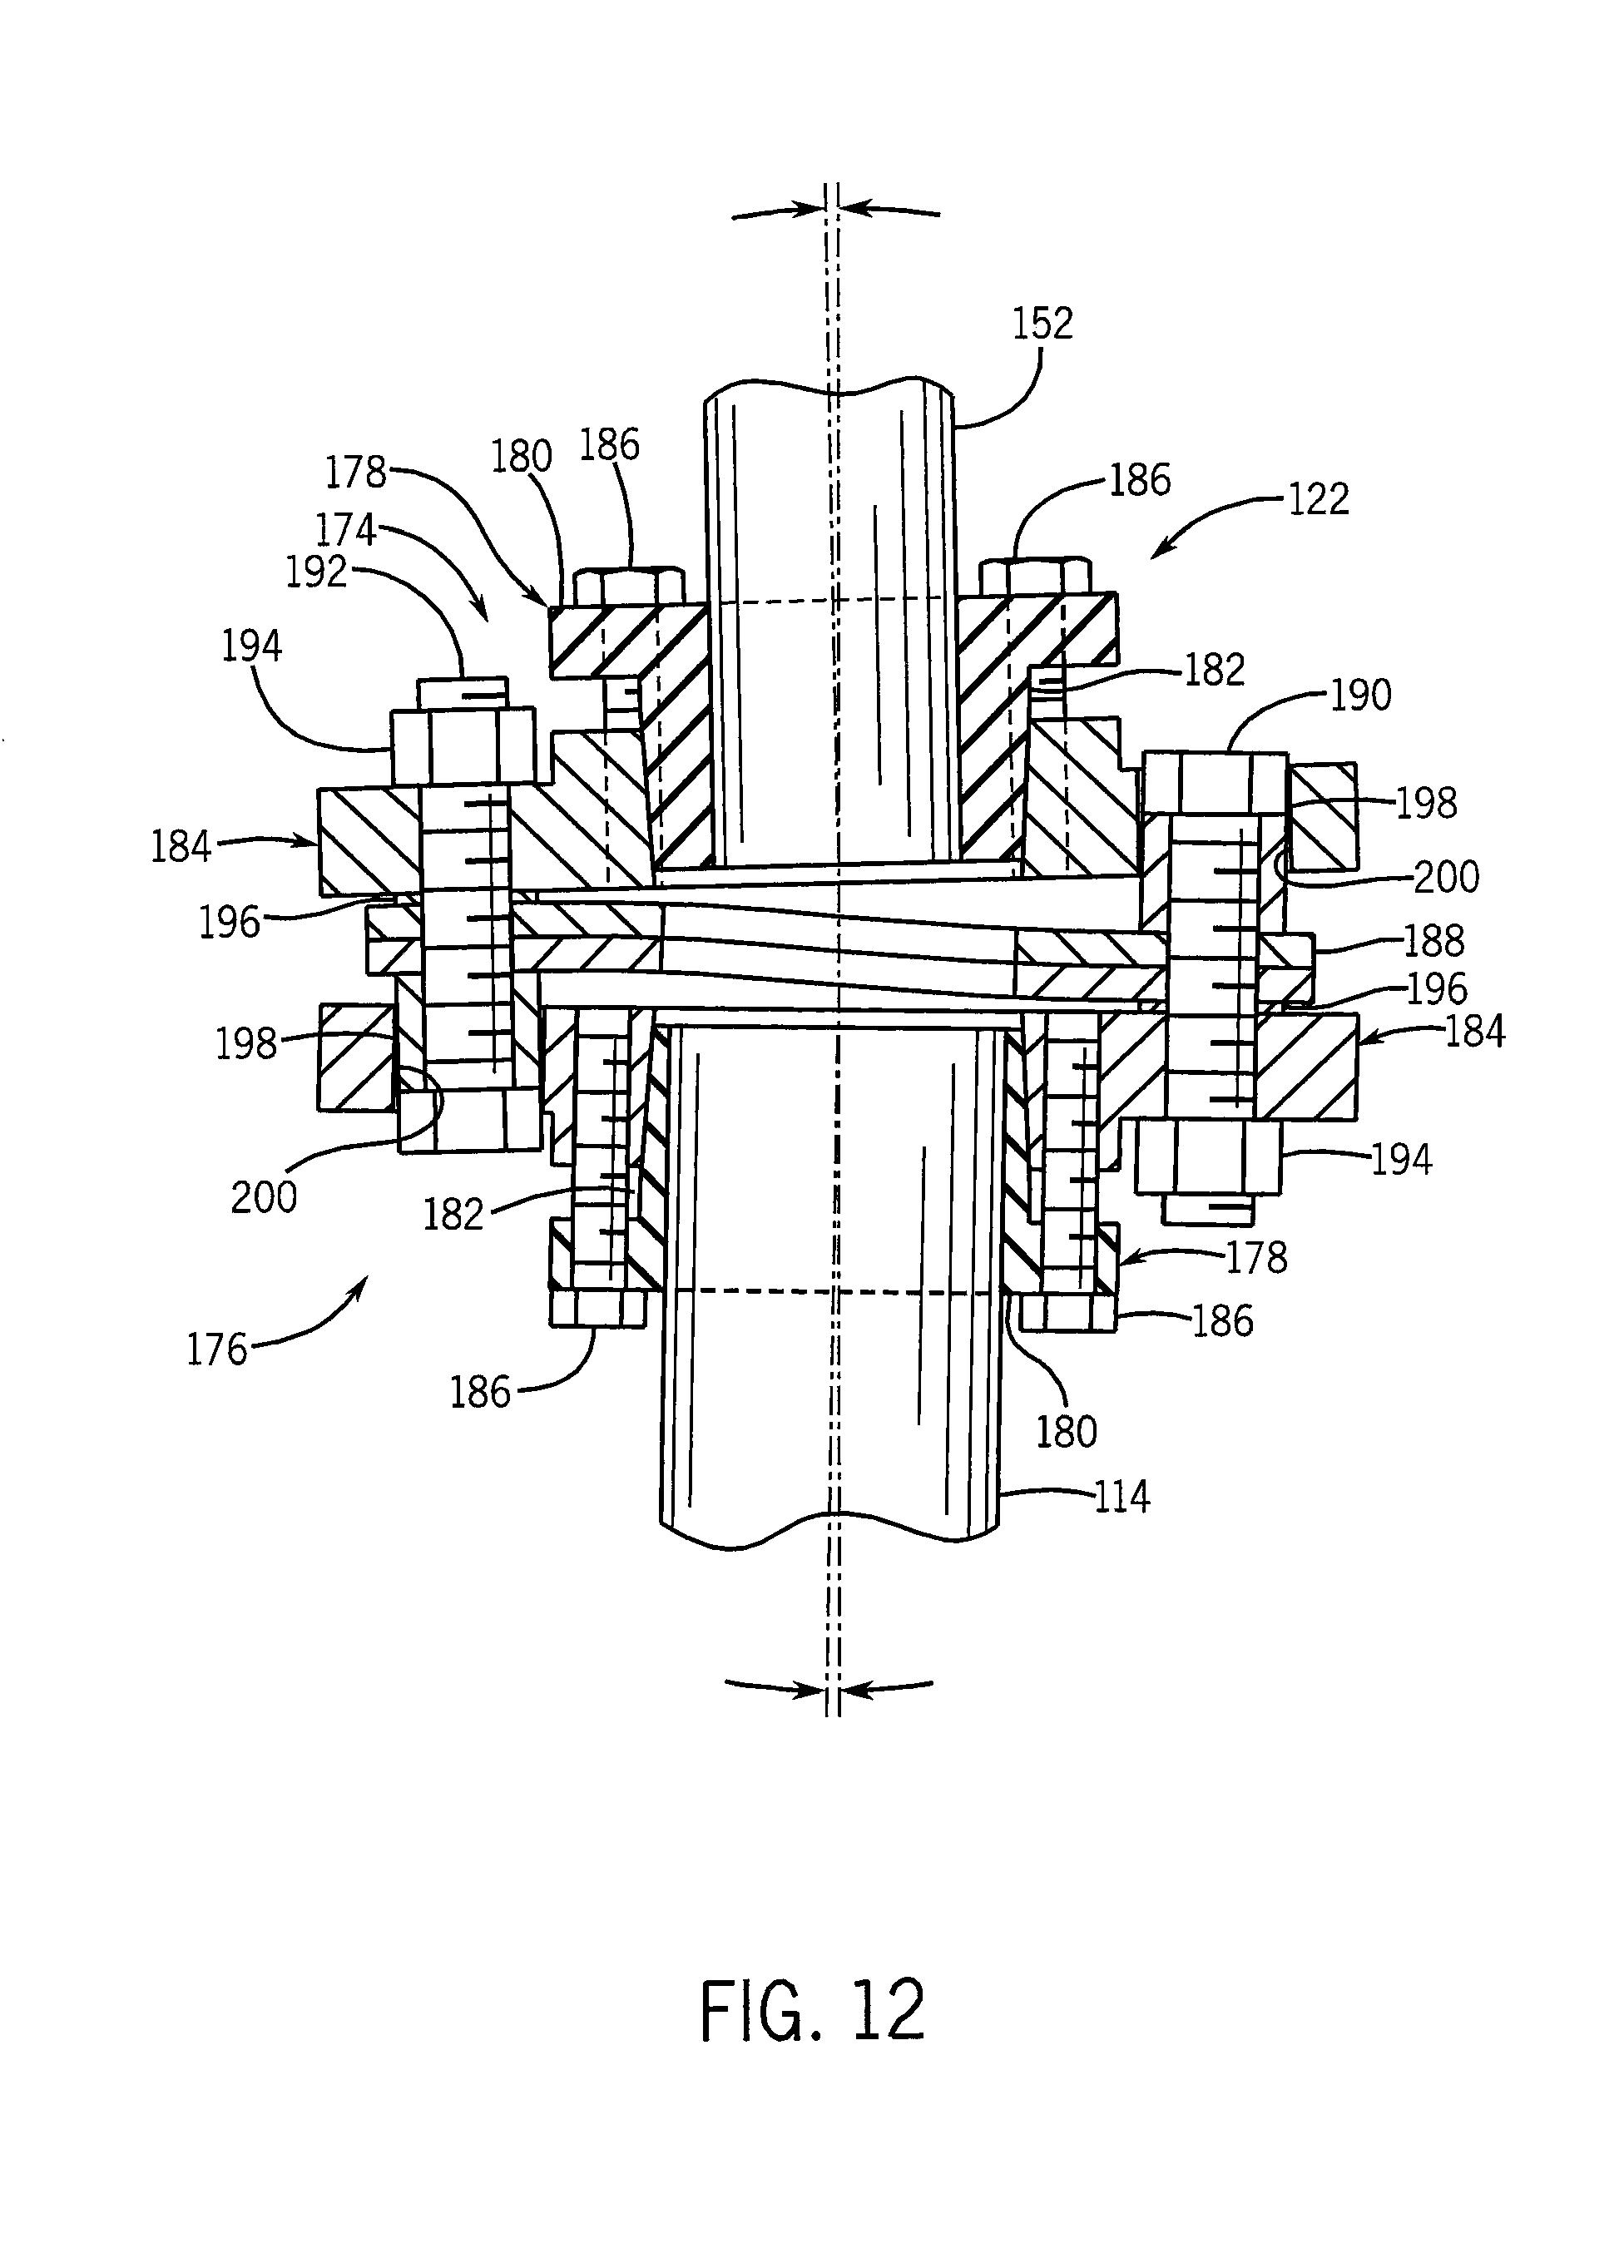 C230 2007 engine diagram further egr valve location 2003 ford escape solenoid likewise mercedes benz 190e